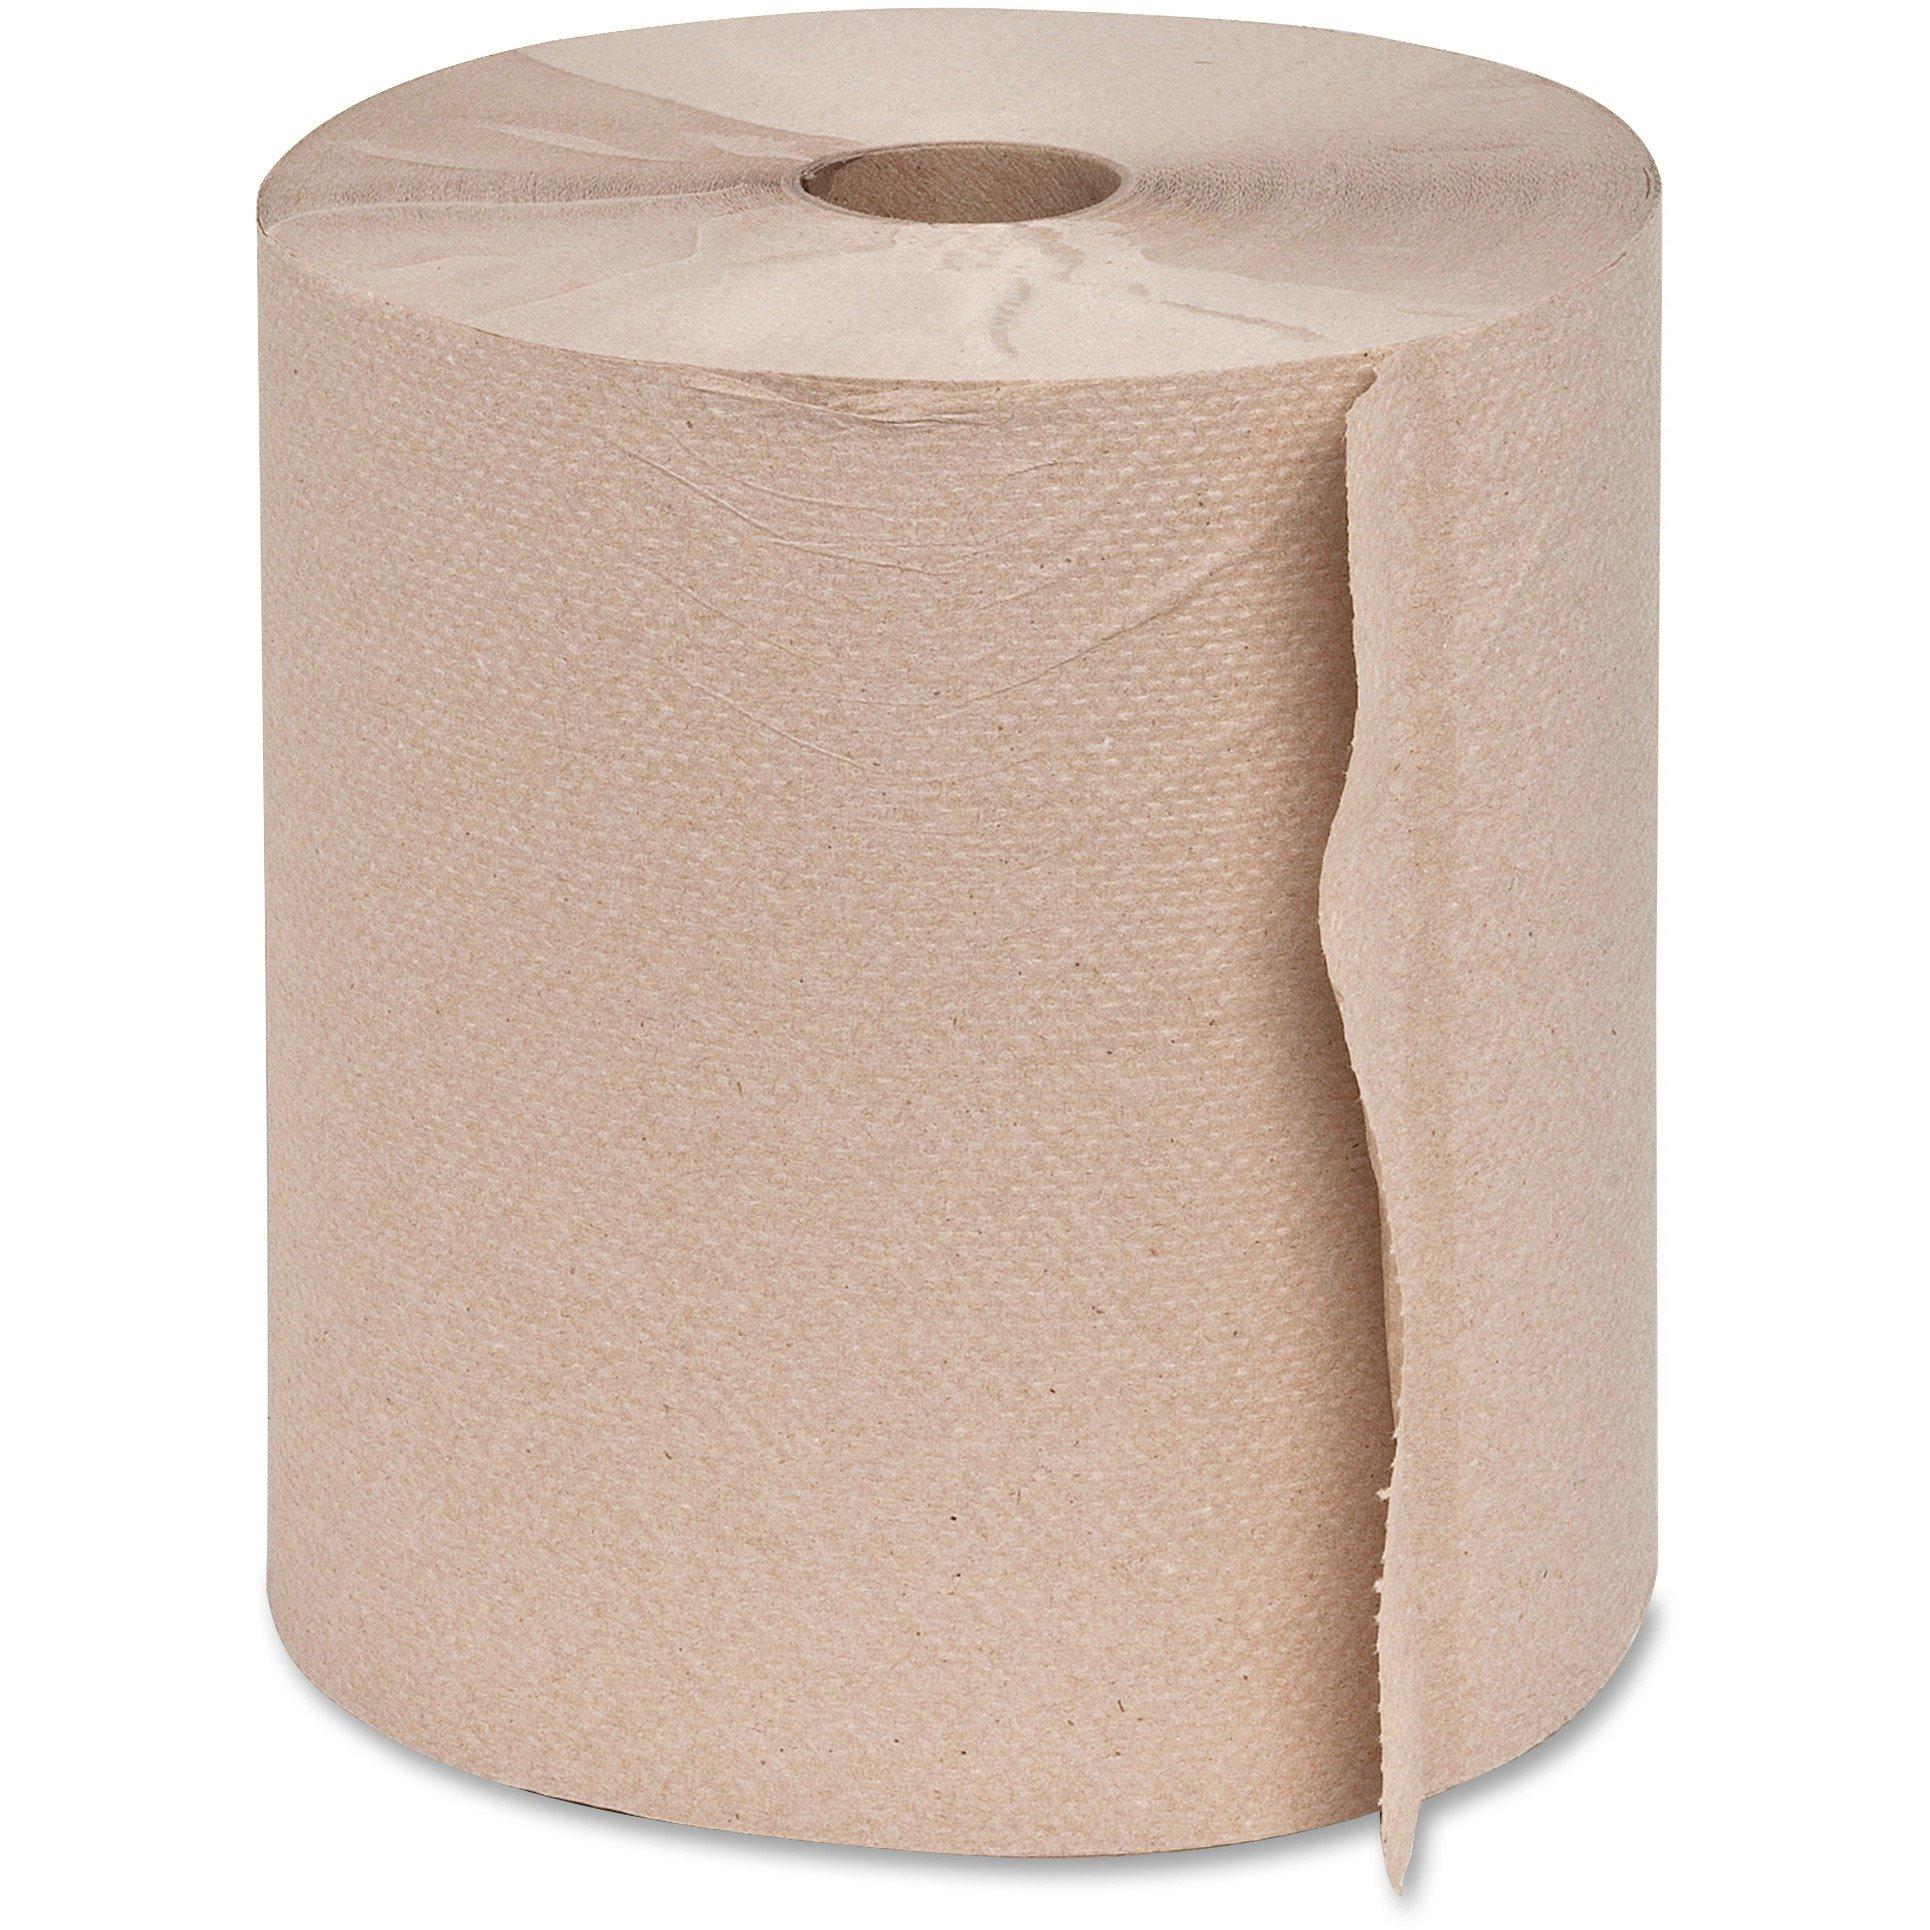 GJO22600 - Genuine Joe Hard Wound Roll Towel